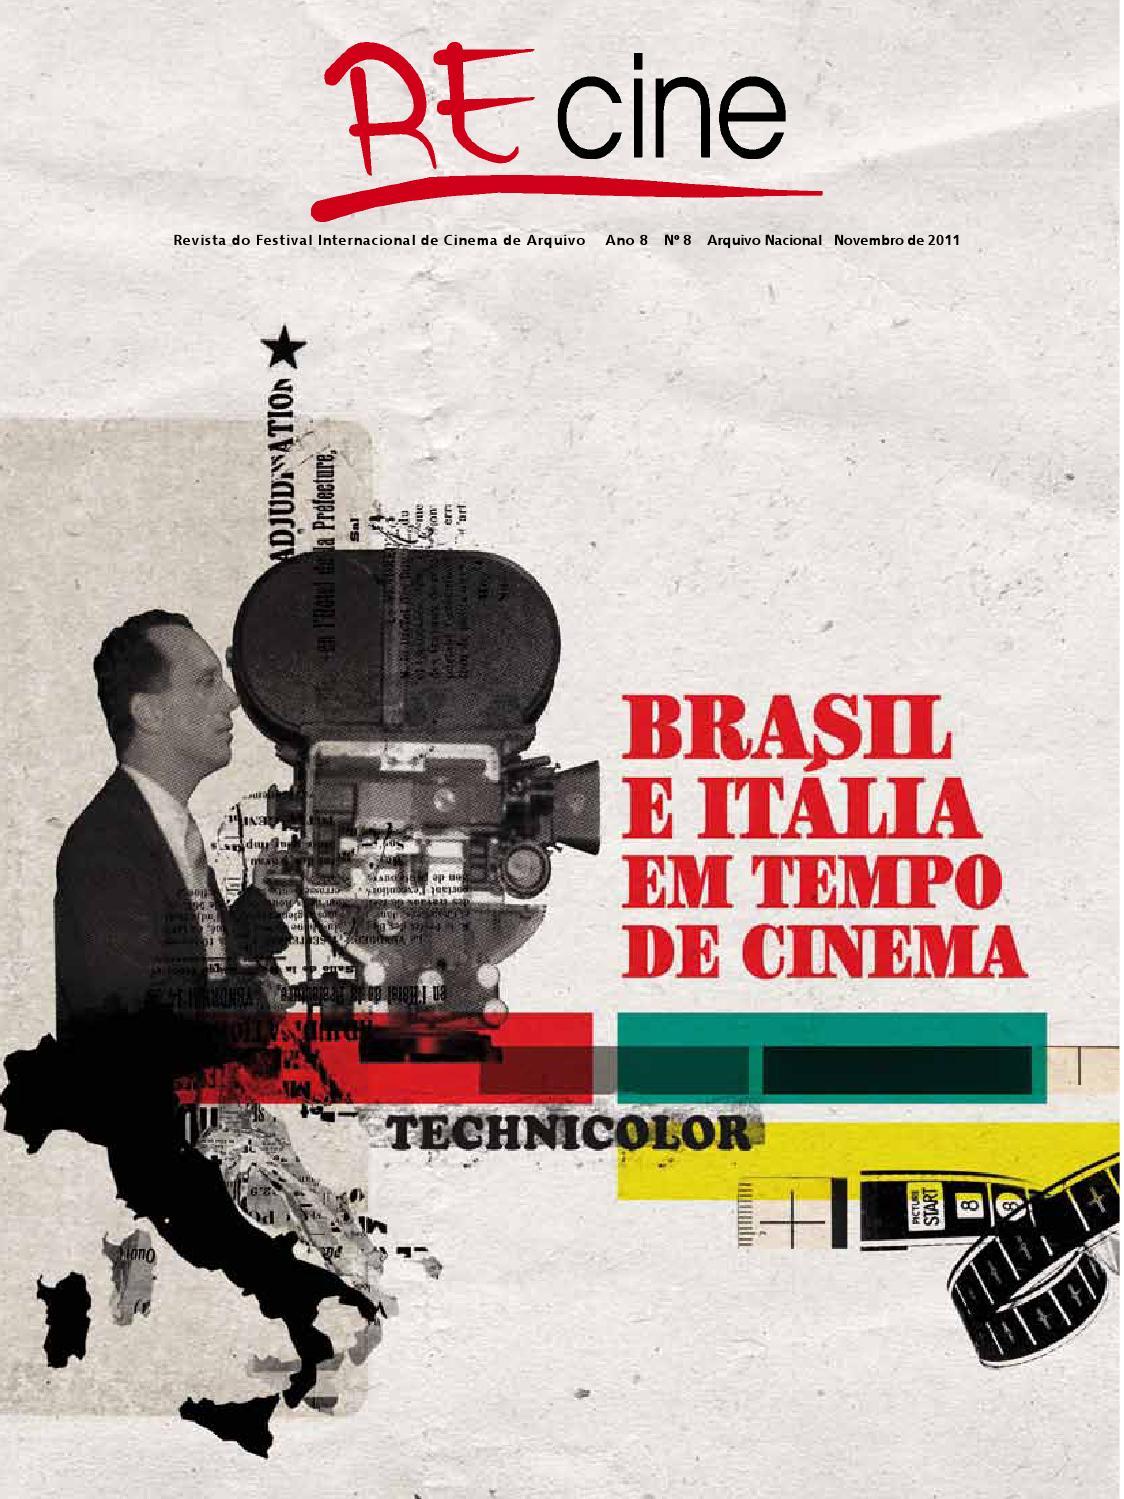 66d4b5c4709 Revista Recine nº 8 - 2011 by Revista Recine - issuu